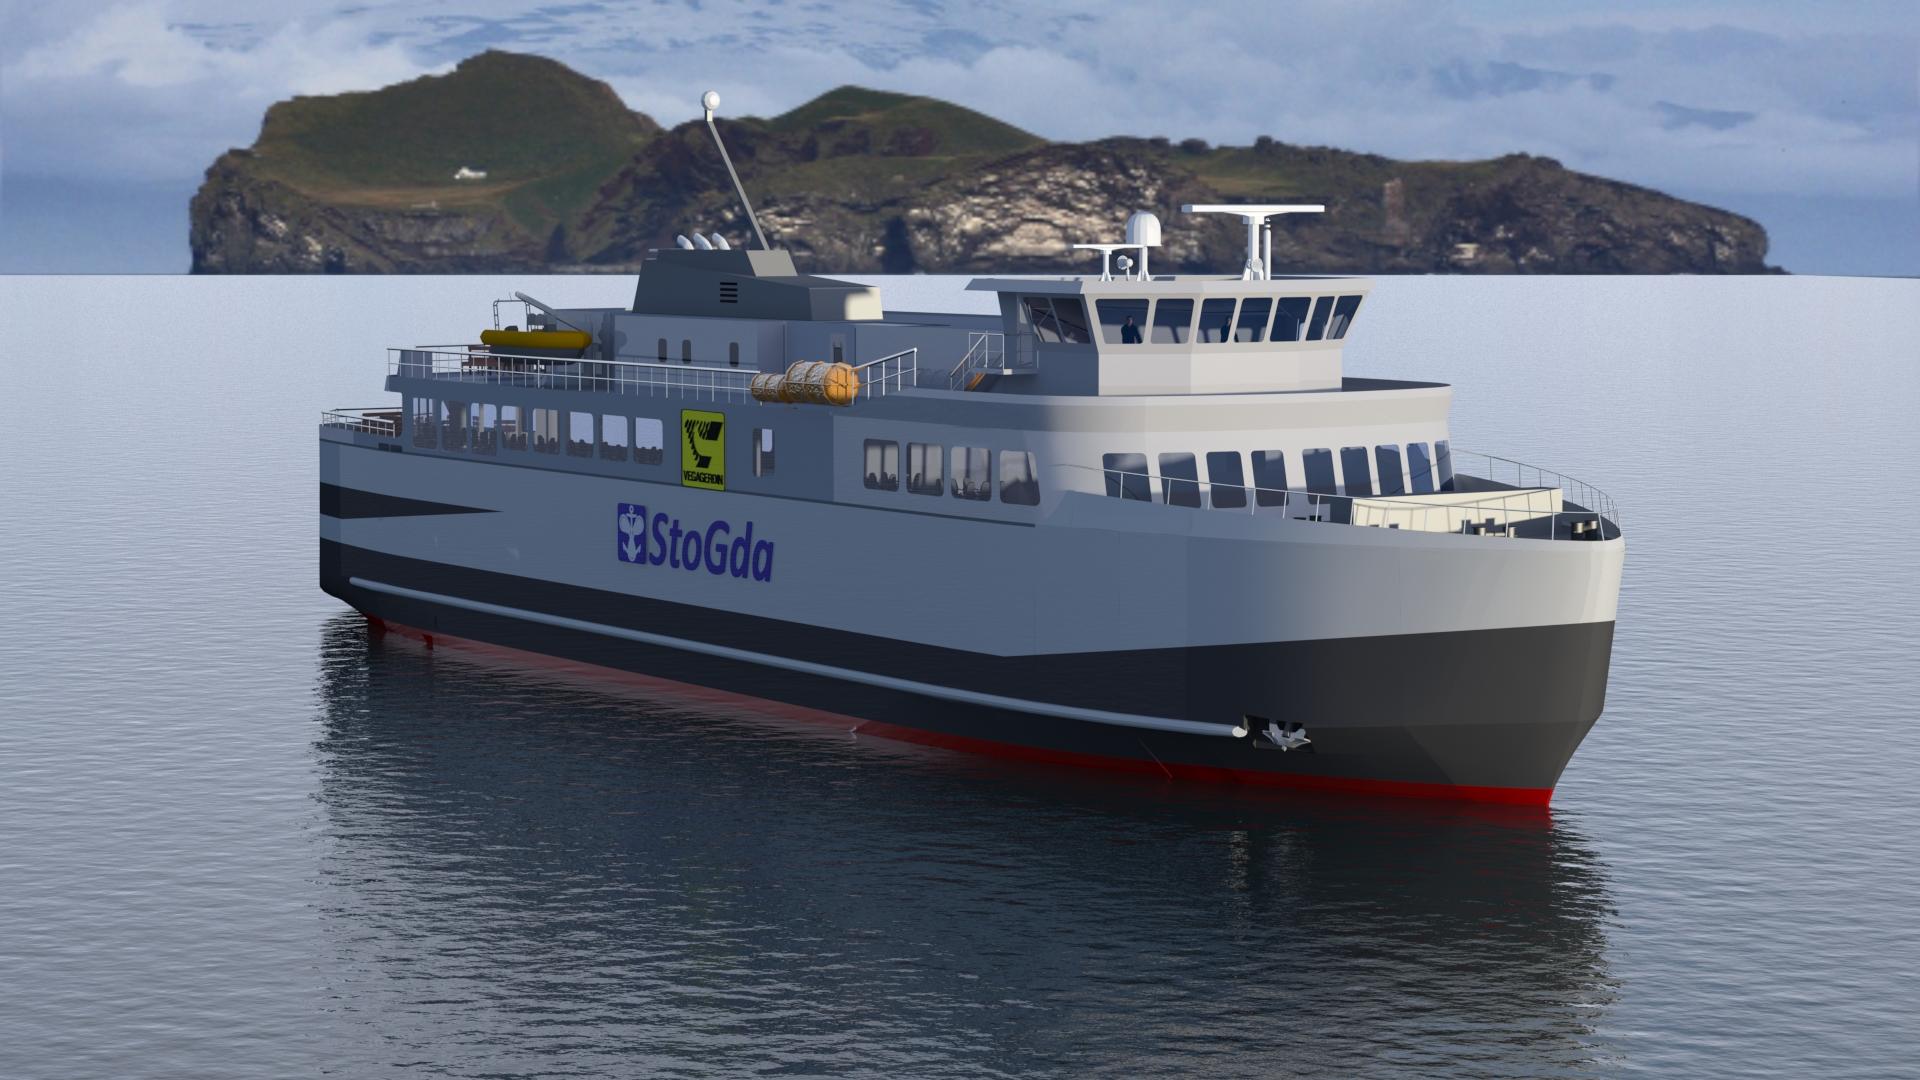 Keel laying for Modern Hybrid Ro-Ro Passenger Ferry - StoGda: ship ...